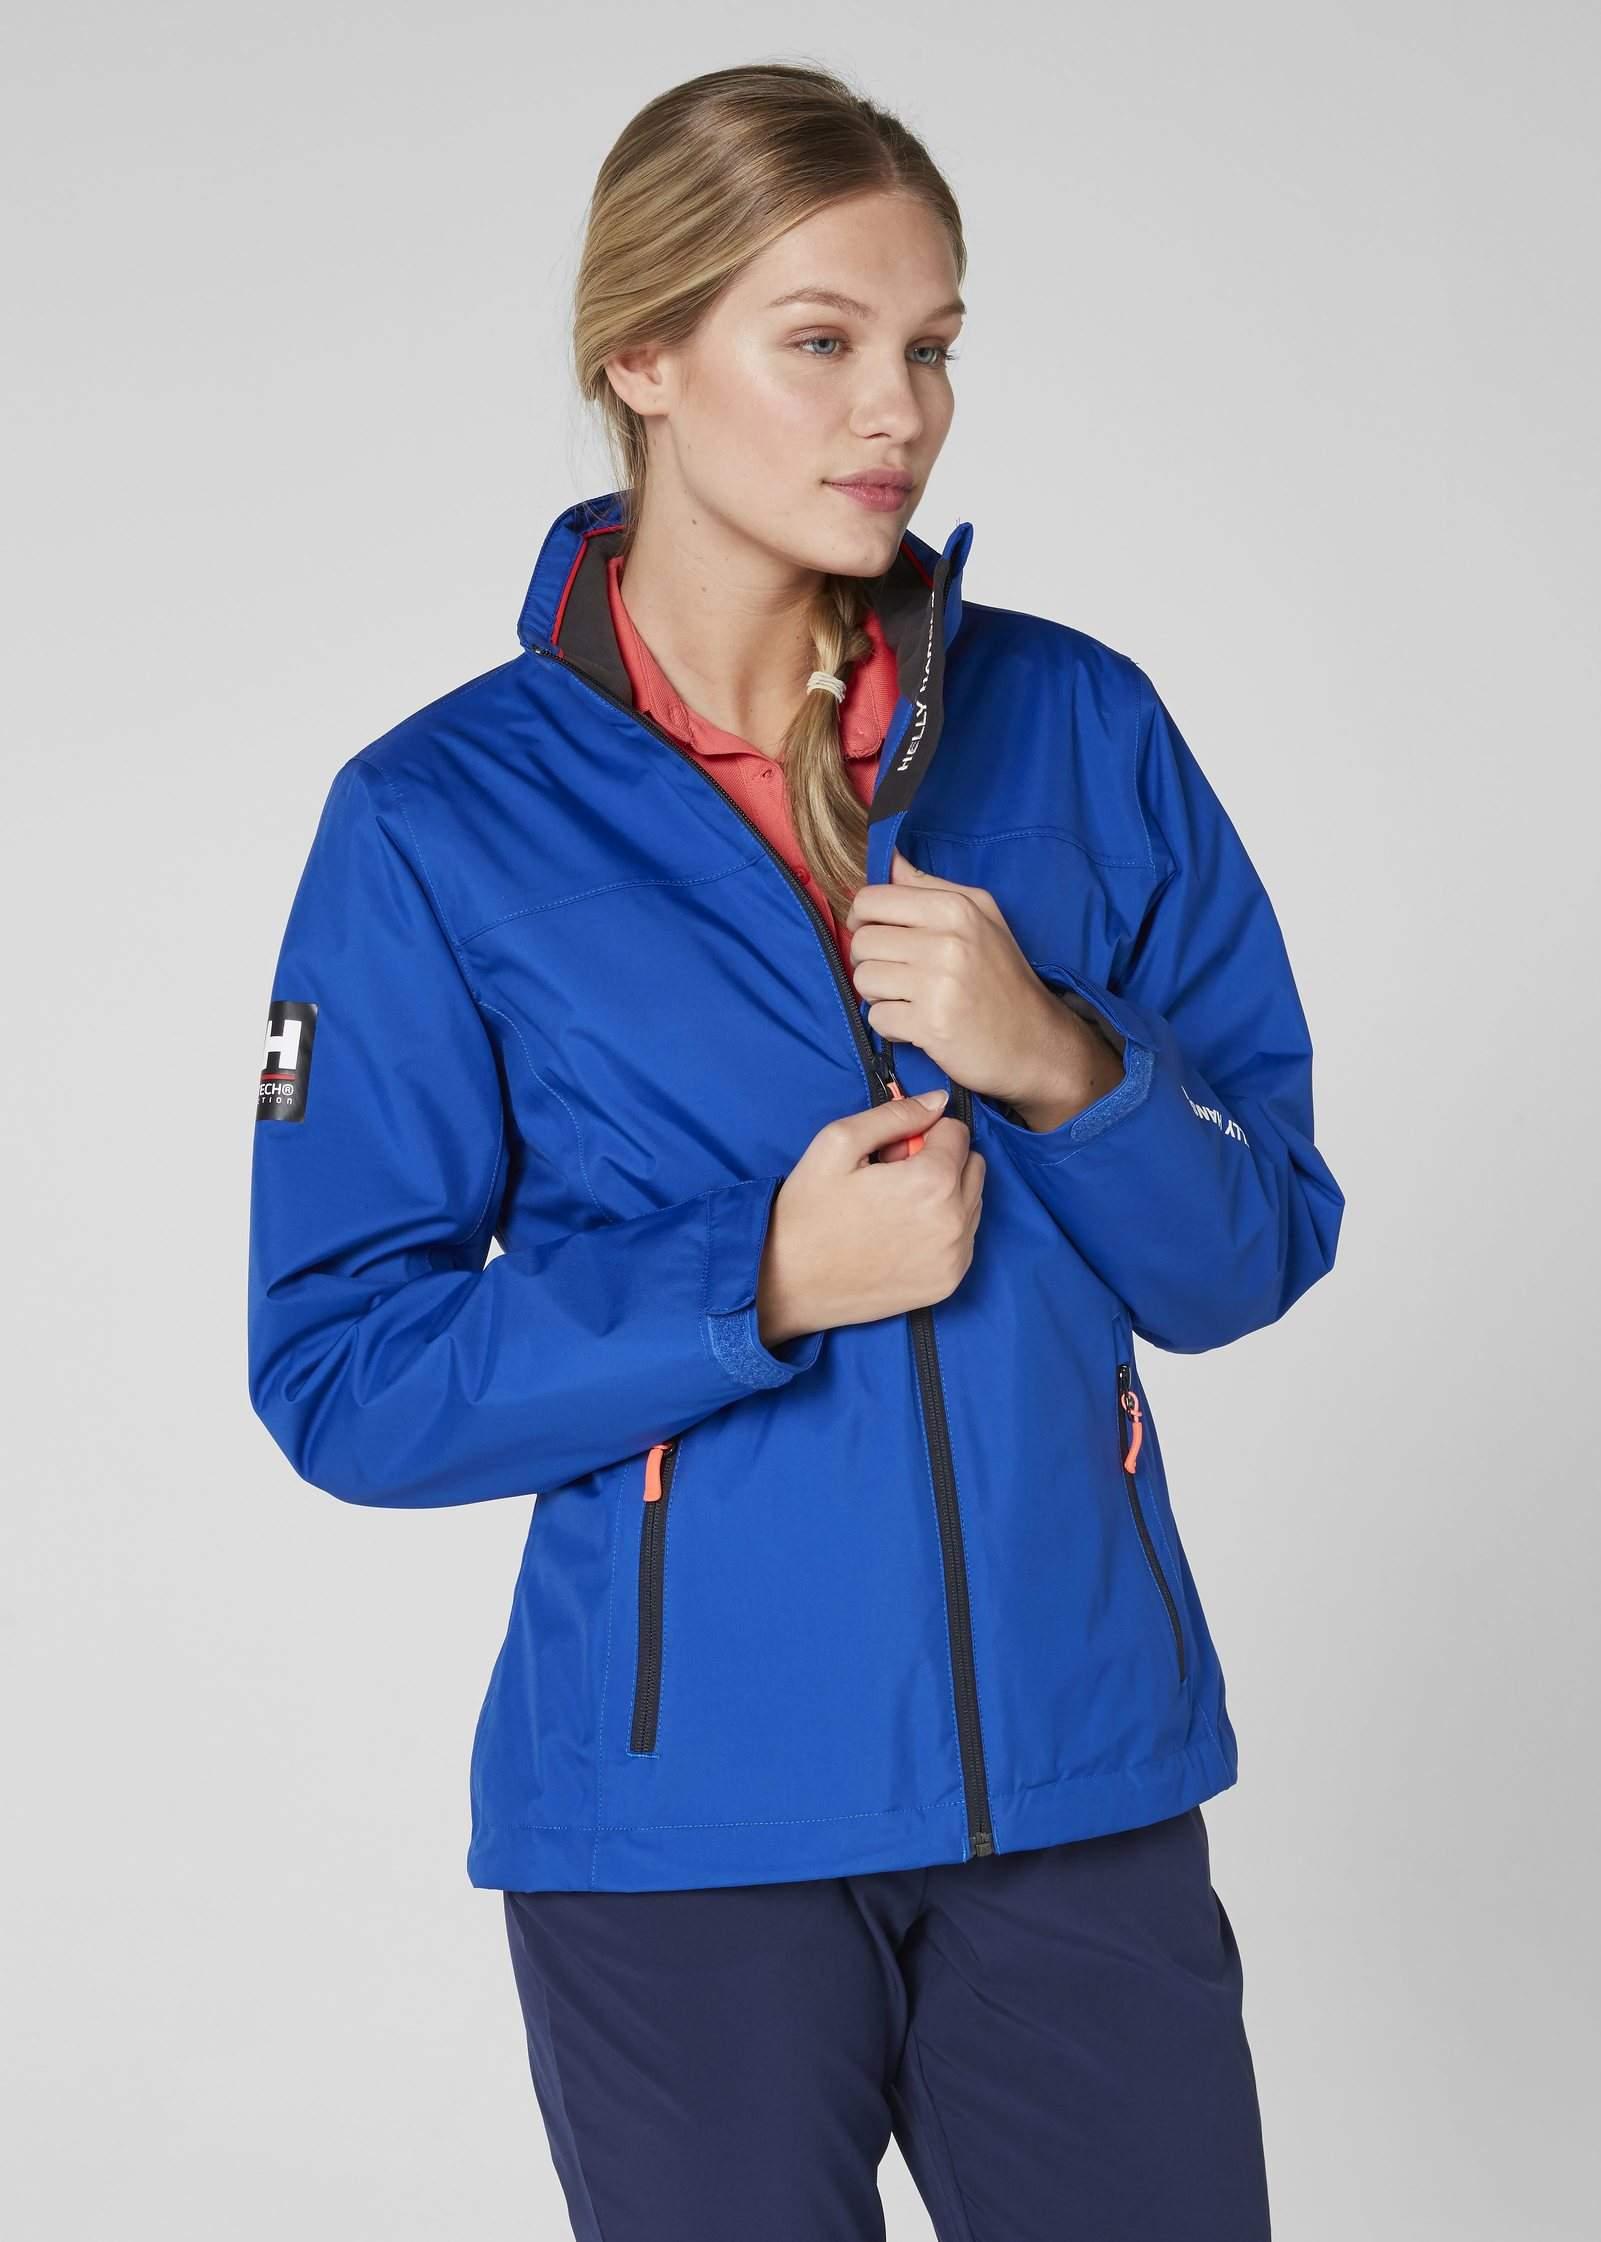 ff1eb9107a7 Women s Helly Hansen CREW MIDLAYER JACKET-Olympian Blue - Sklep ...